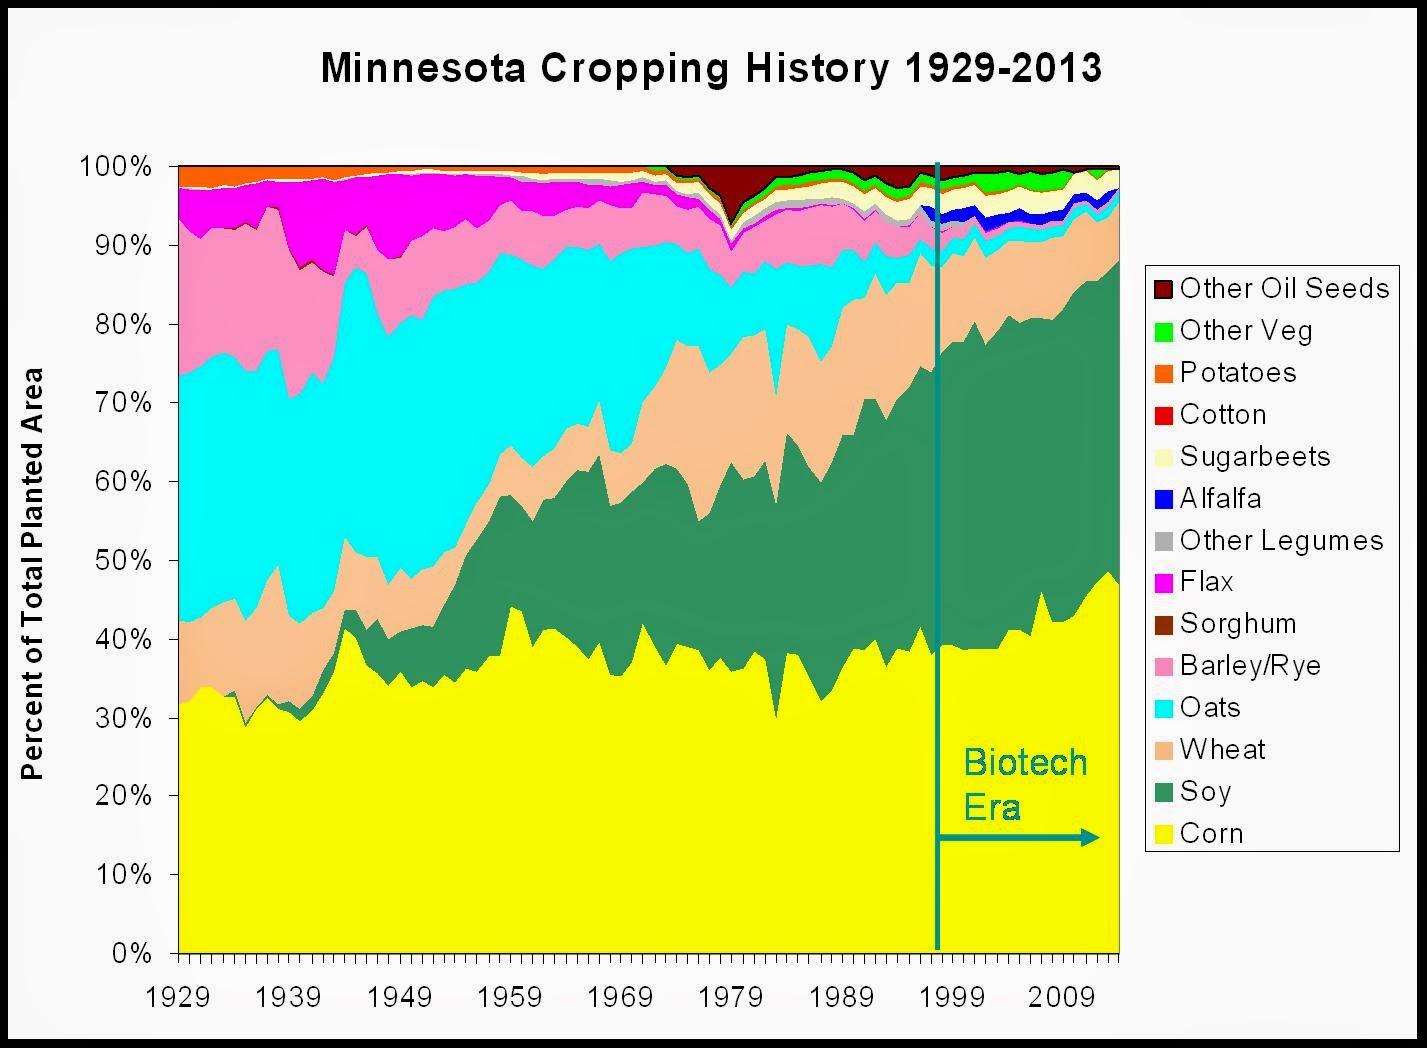 Minnesota crop history